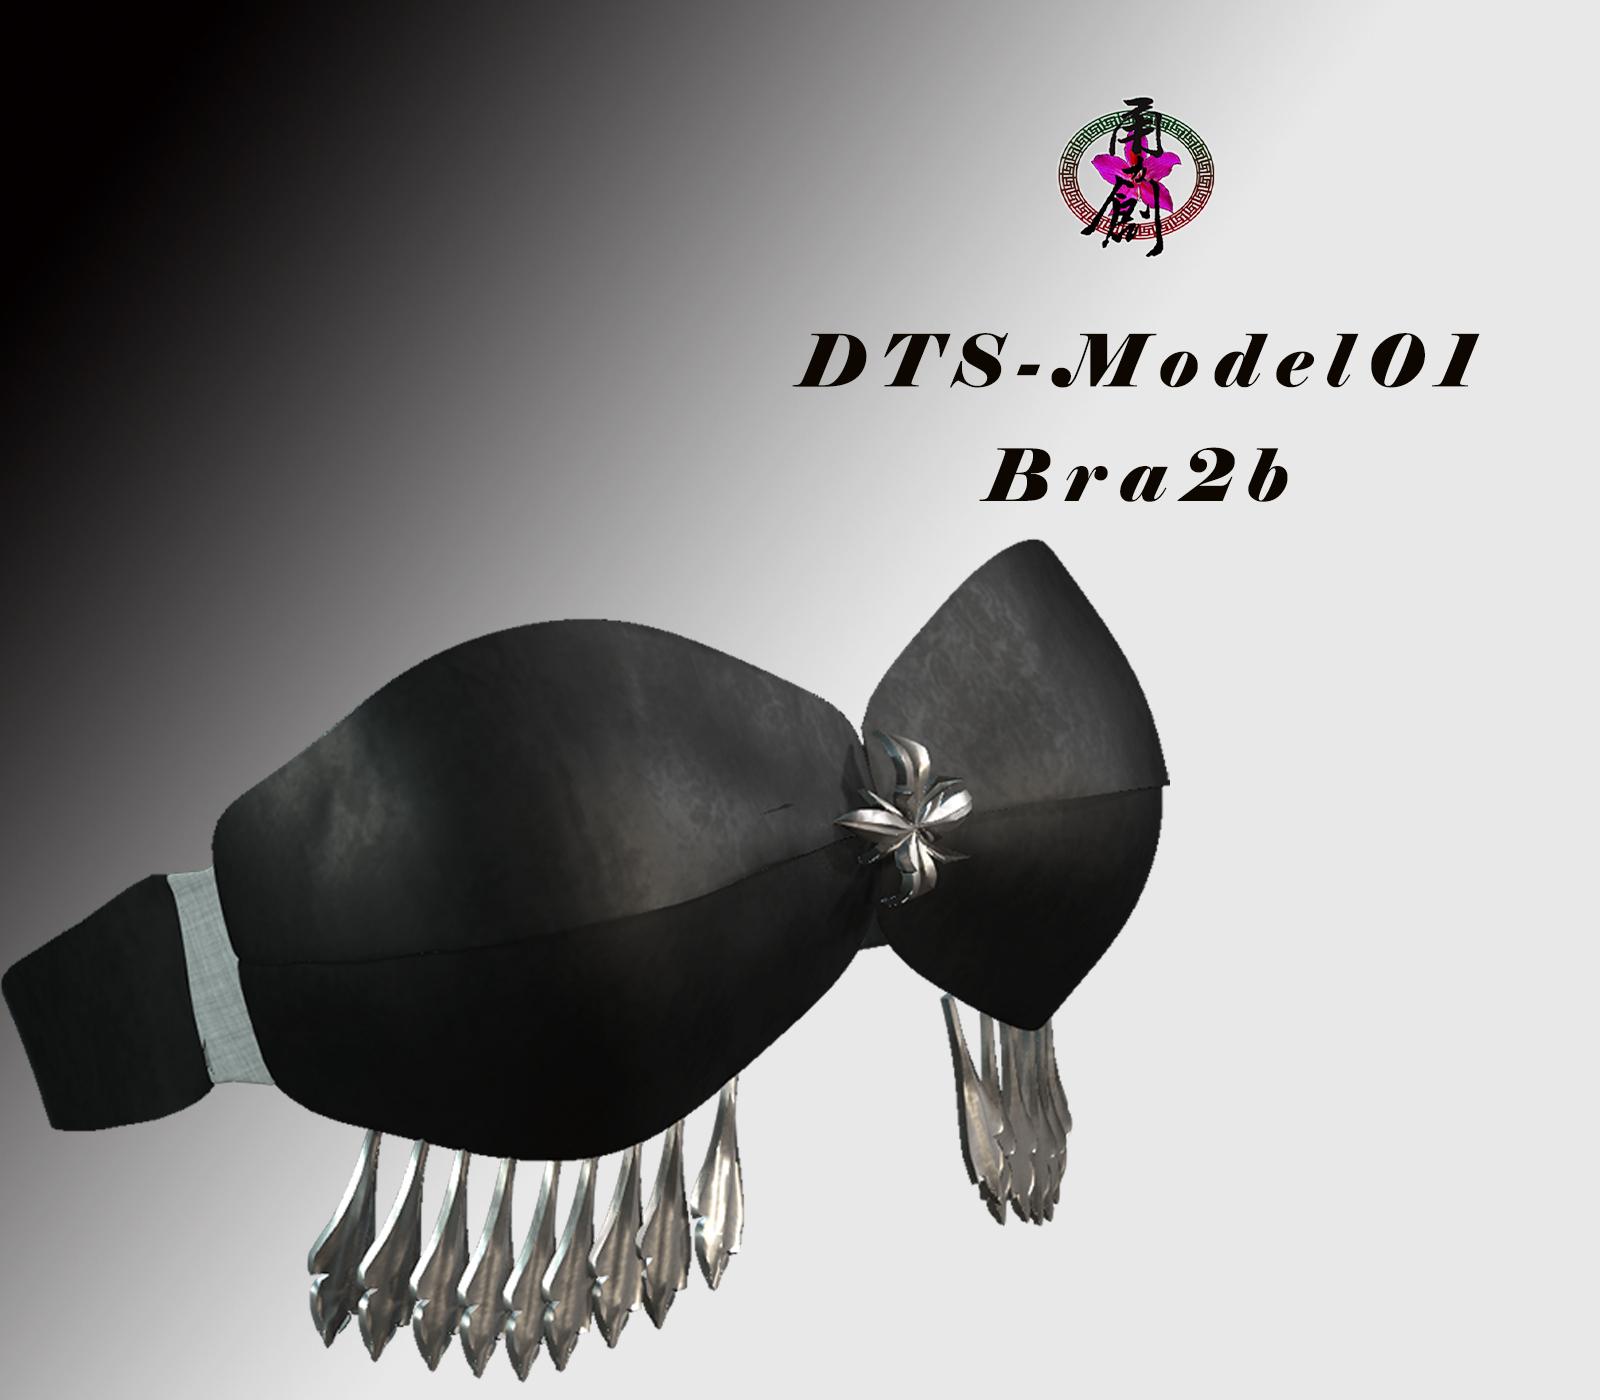 DTS-Model01-BrA2b